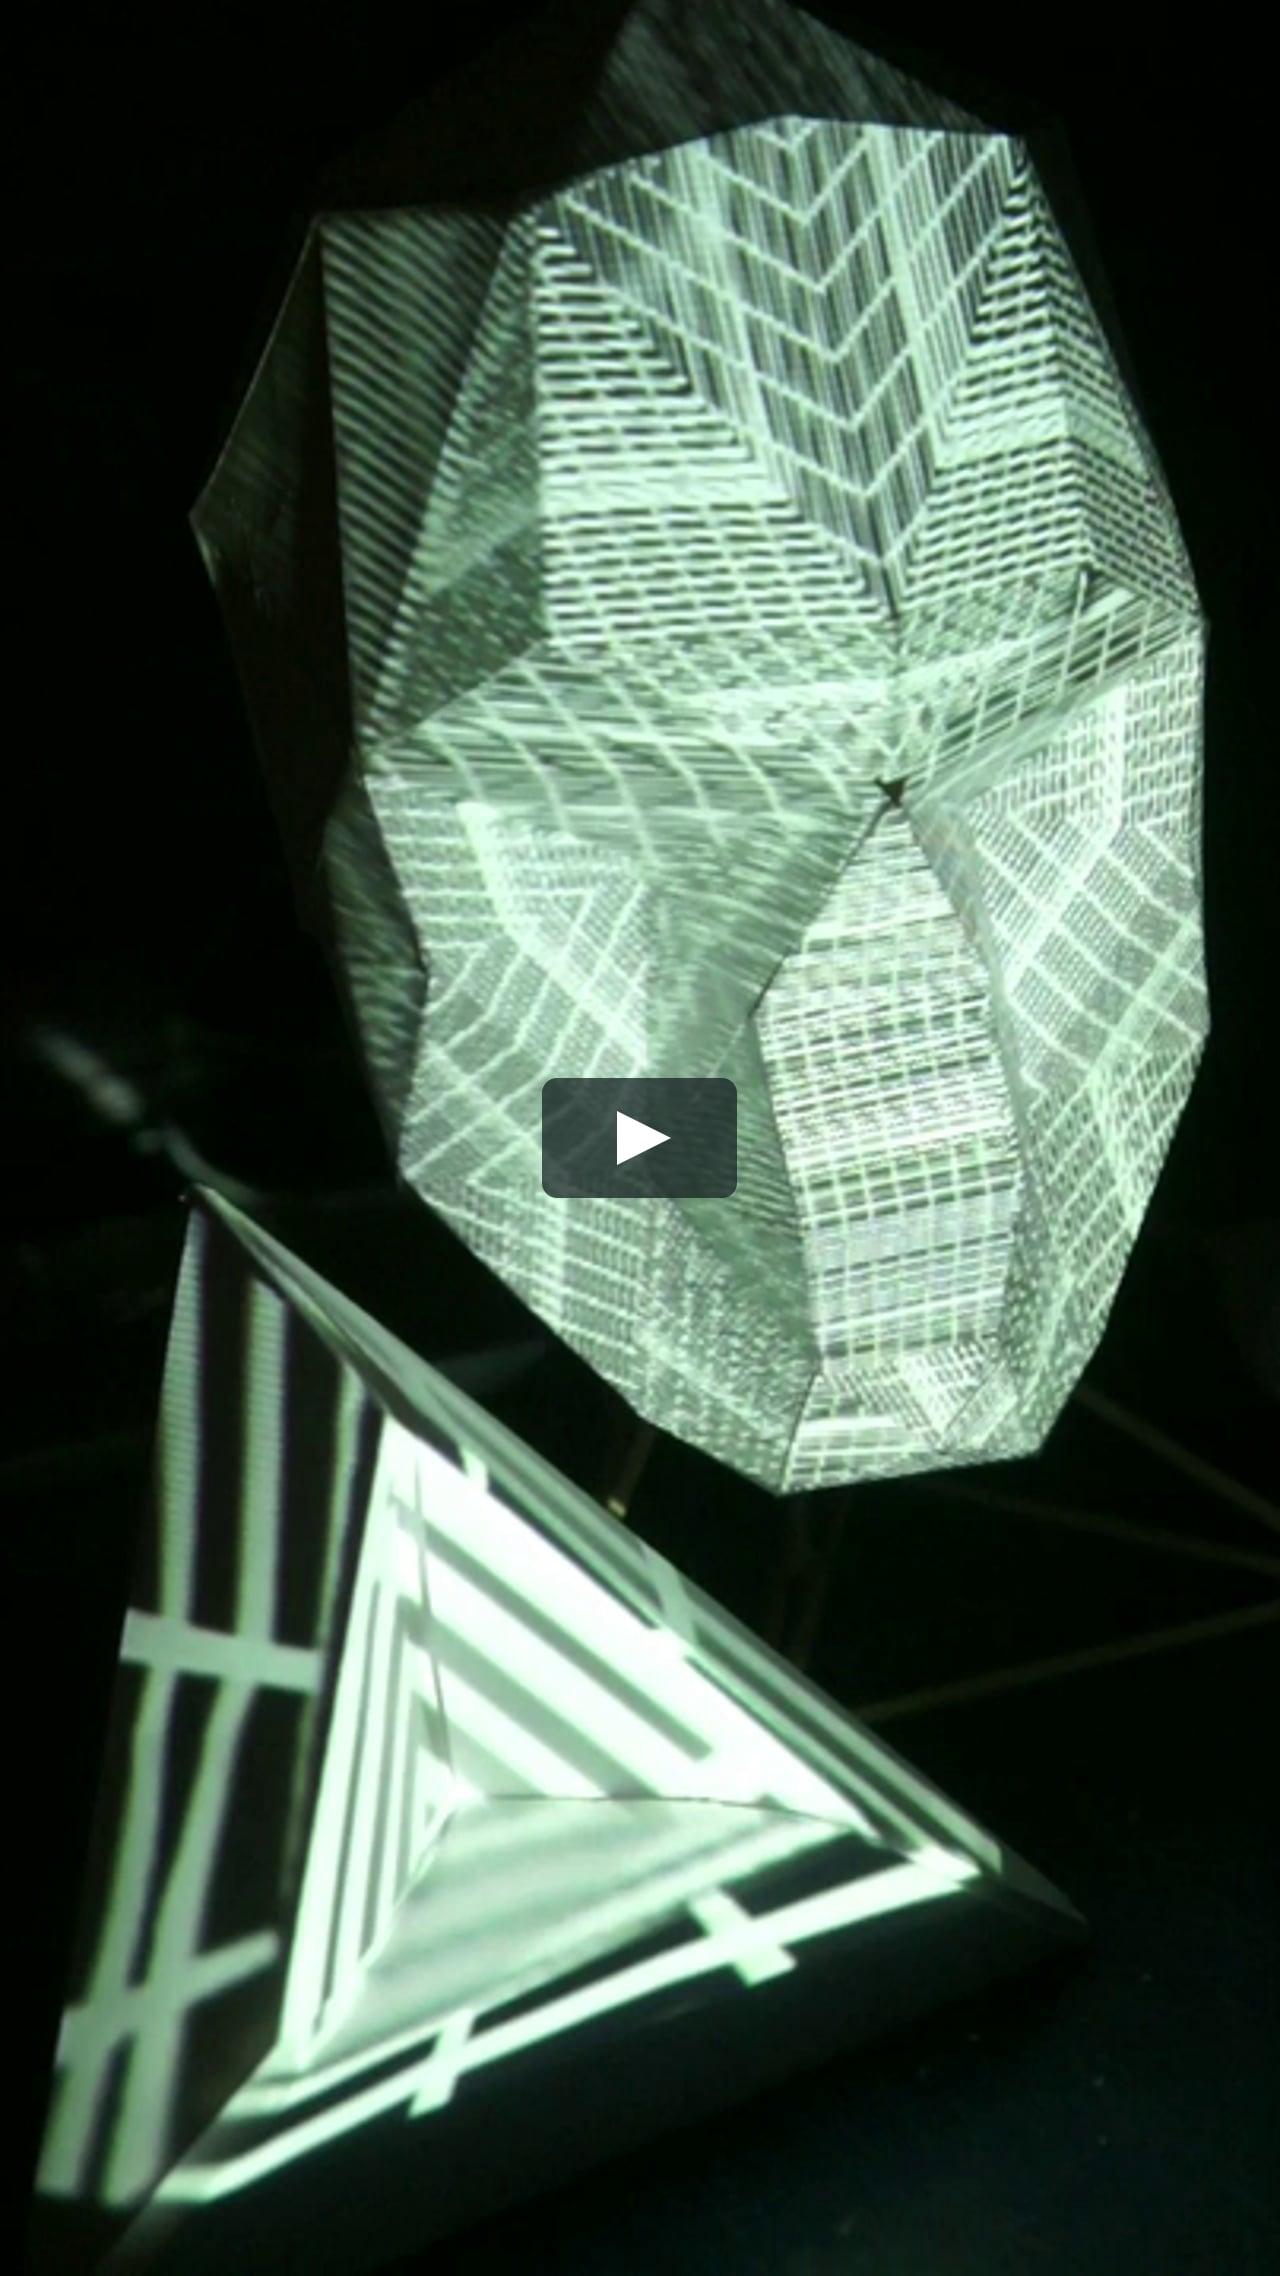 Papercraft TechnoSkull